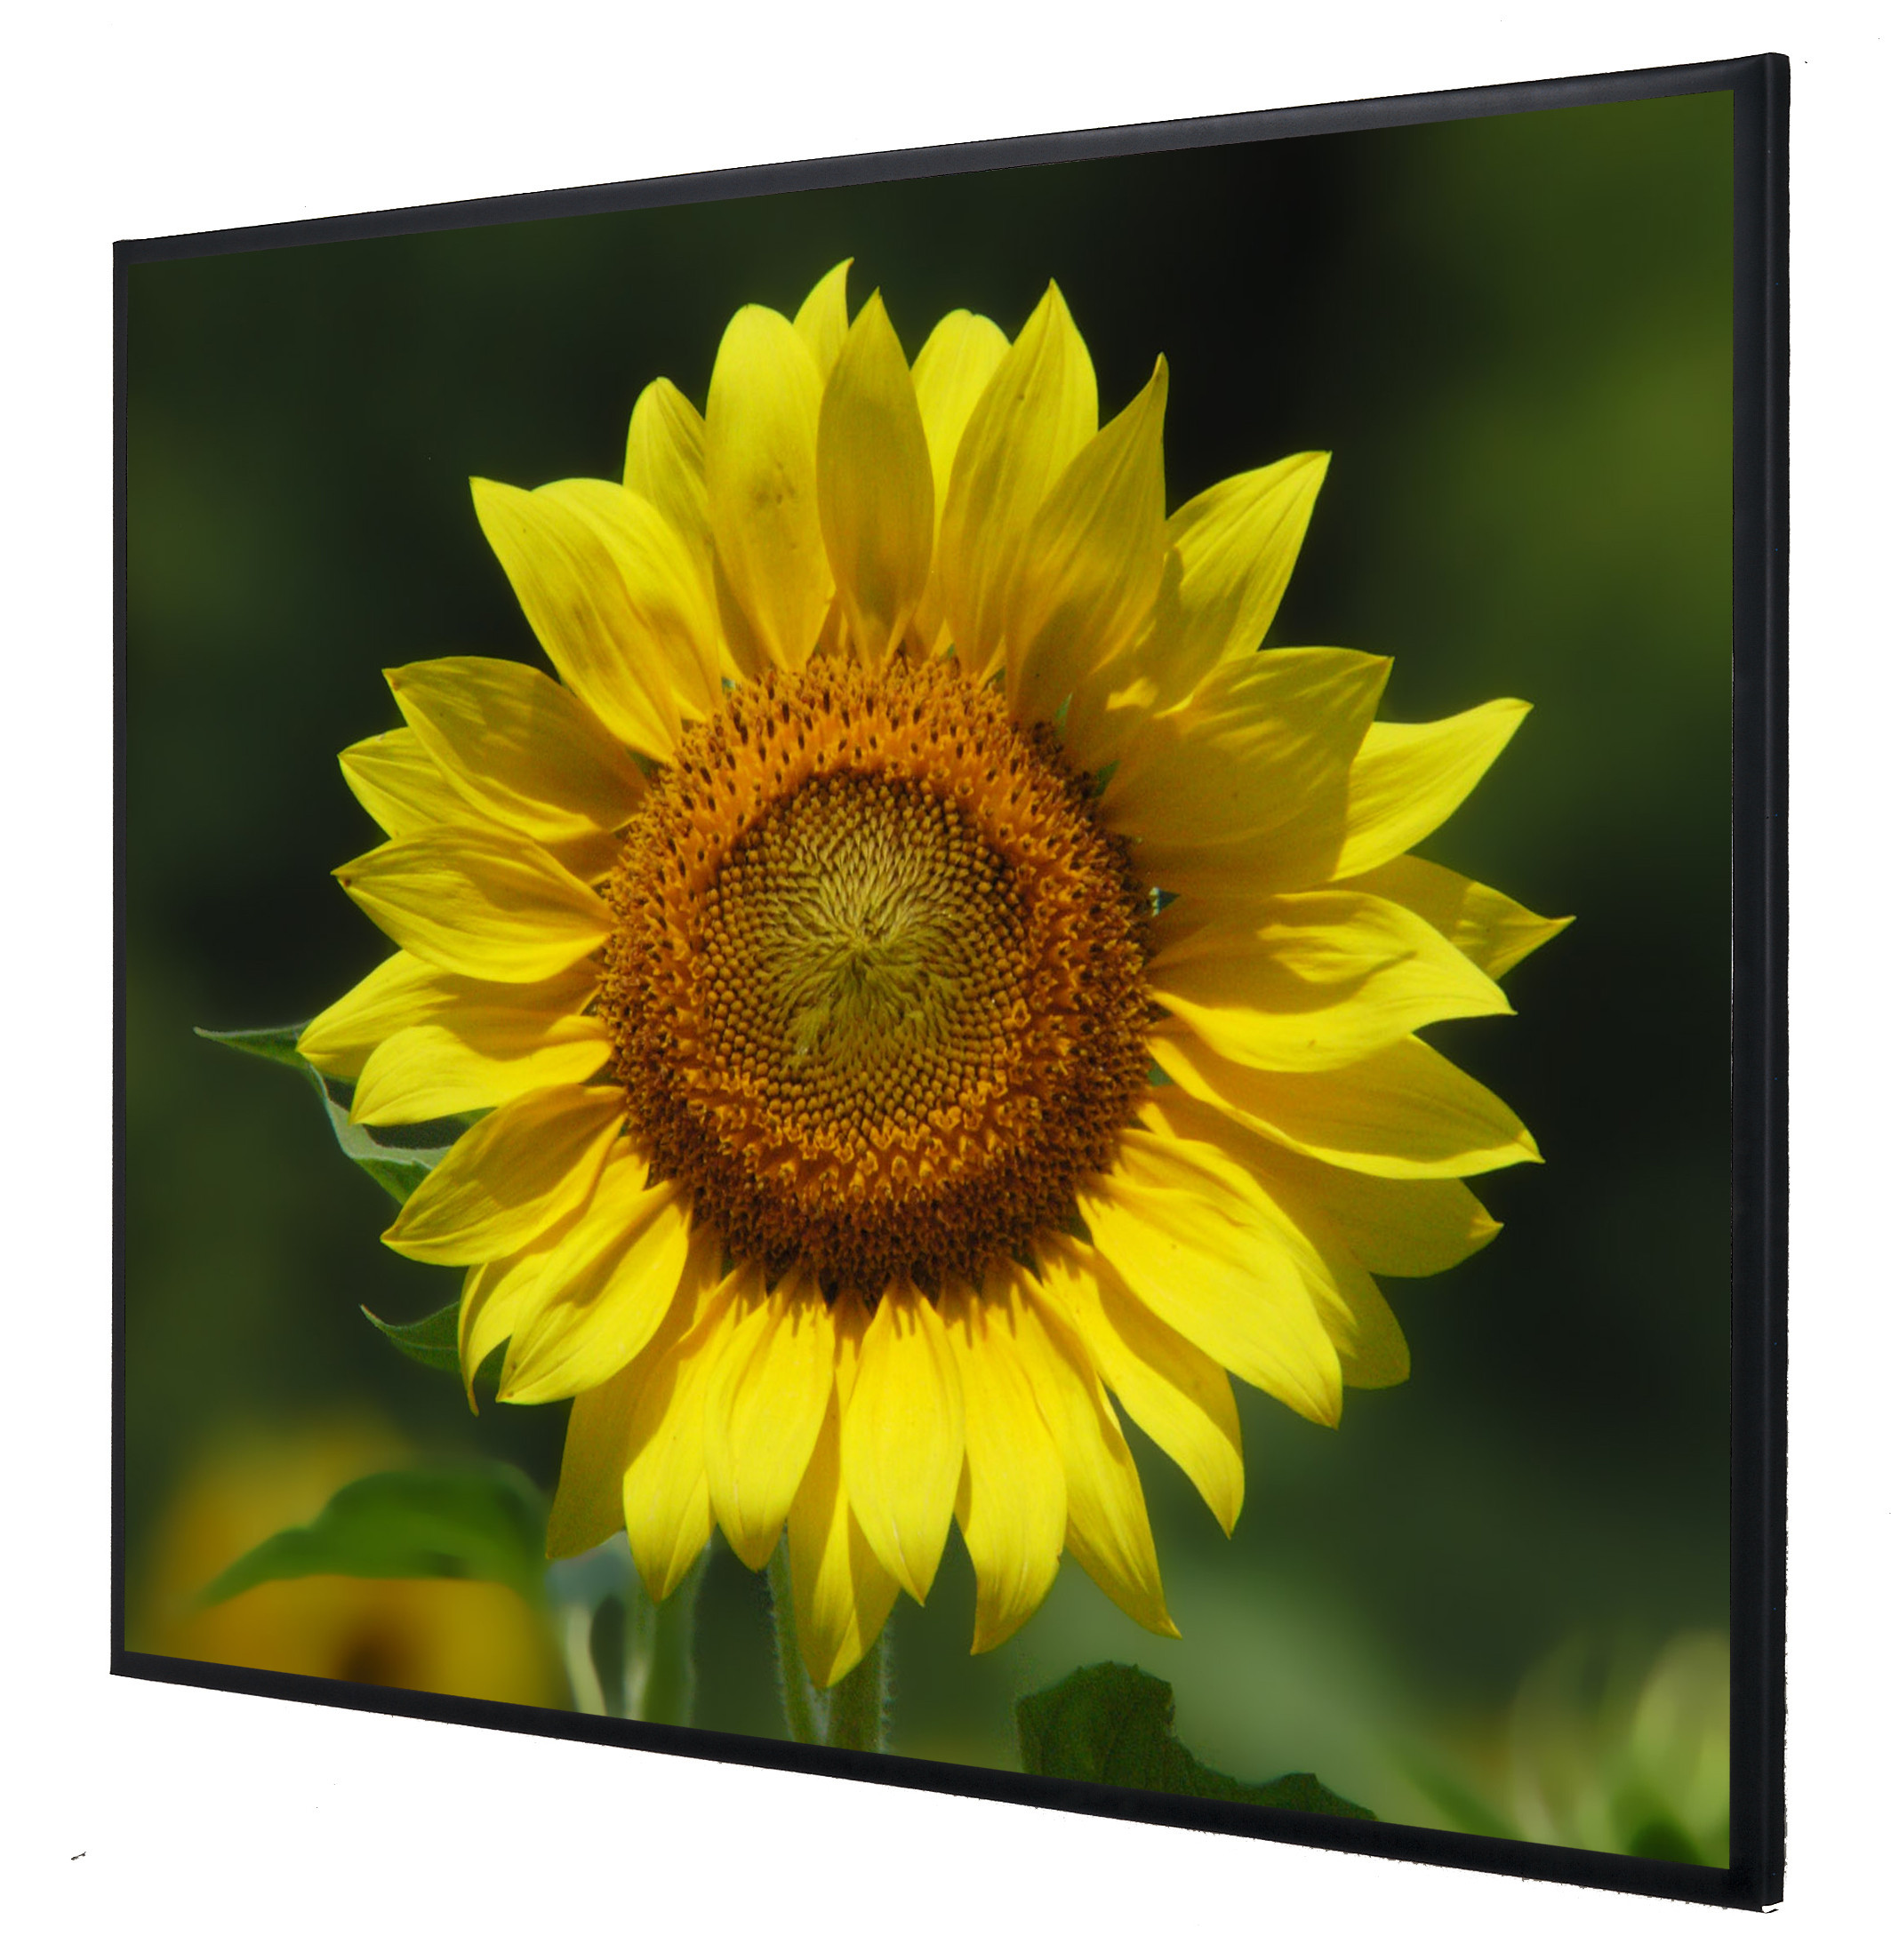 Vision Light 180 x 135 cm video format med Veltex og ReAct filmdug